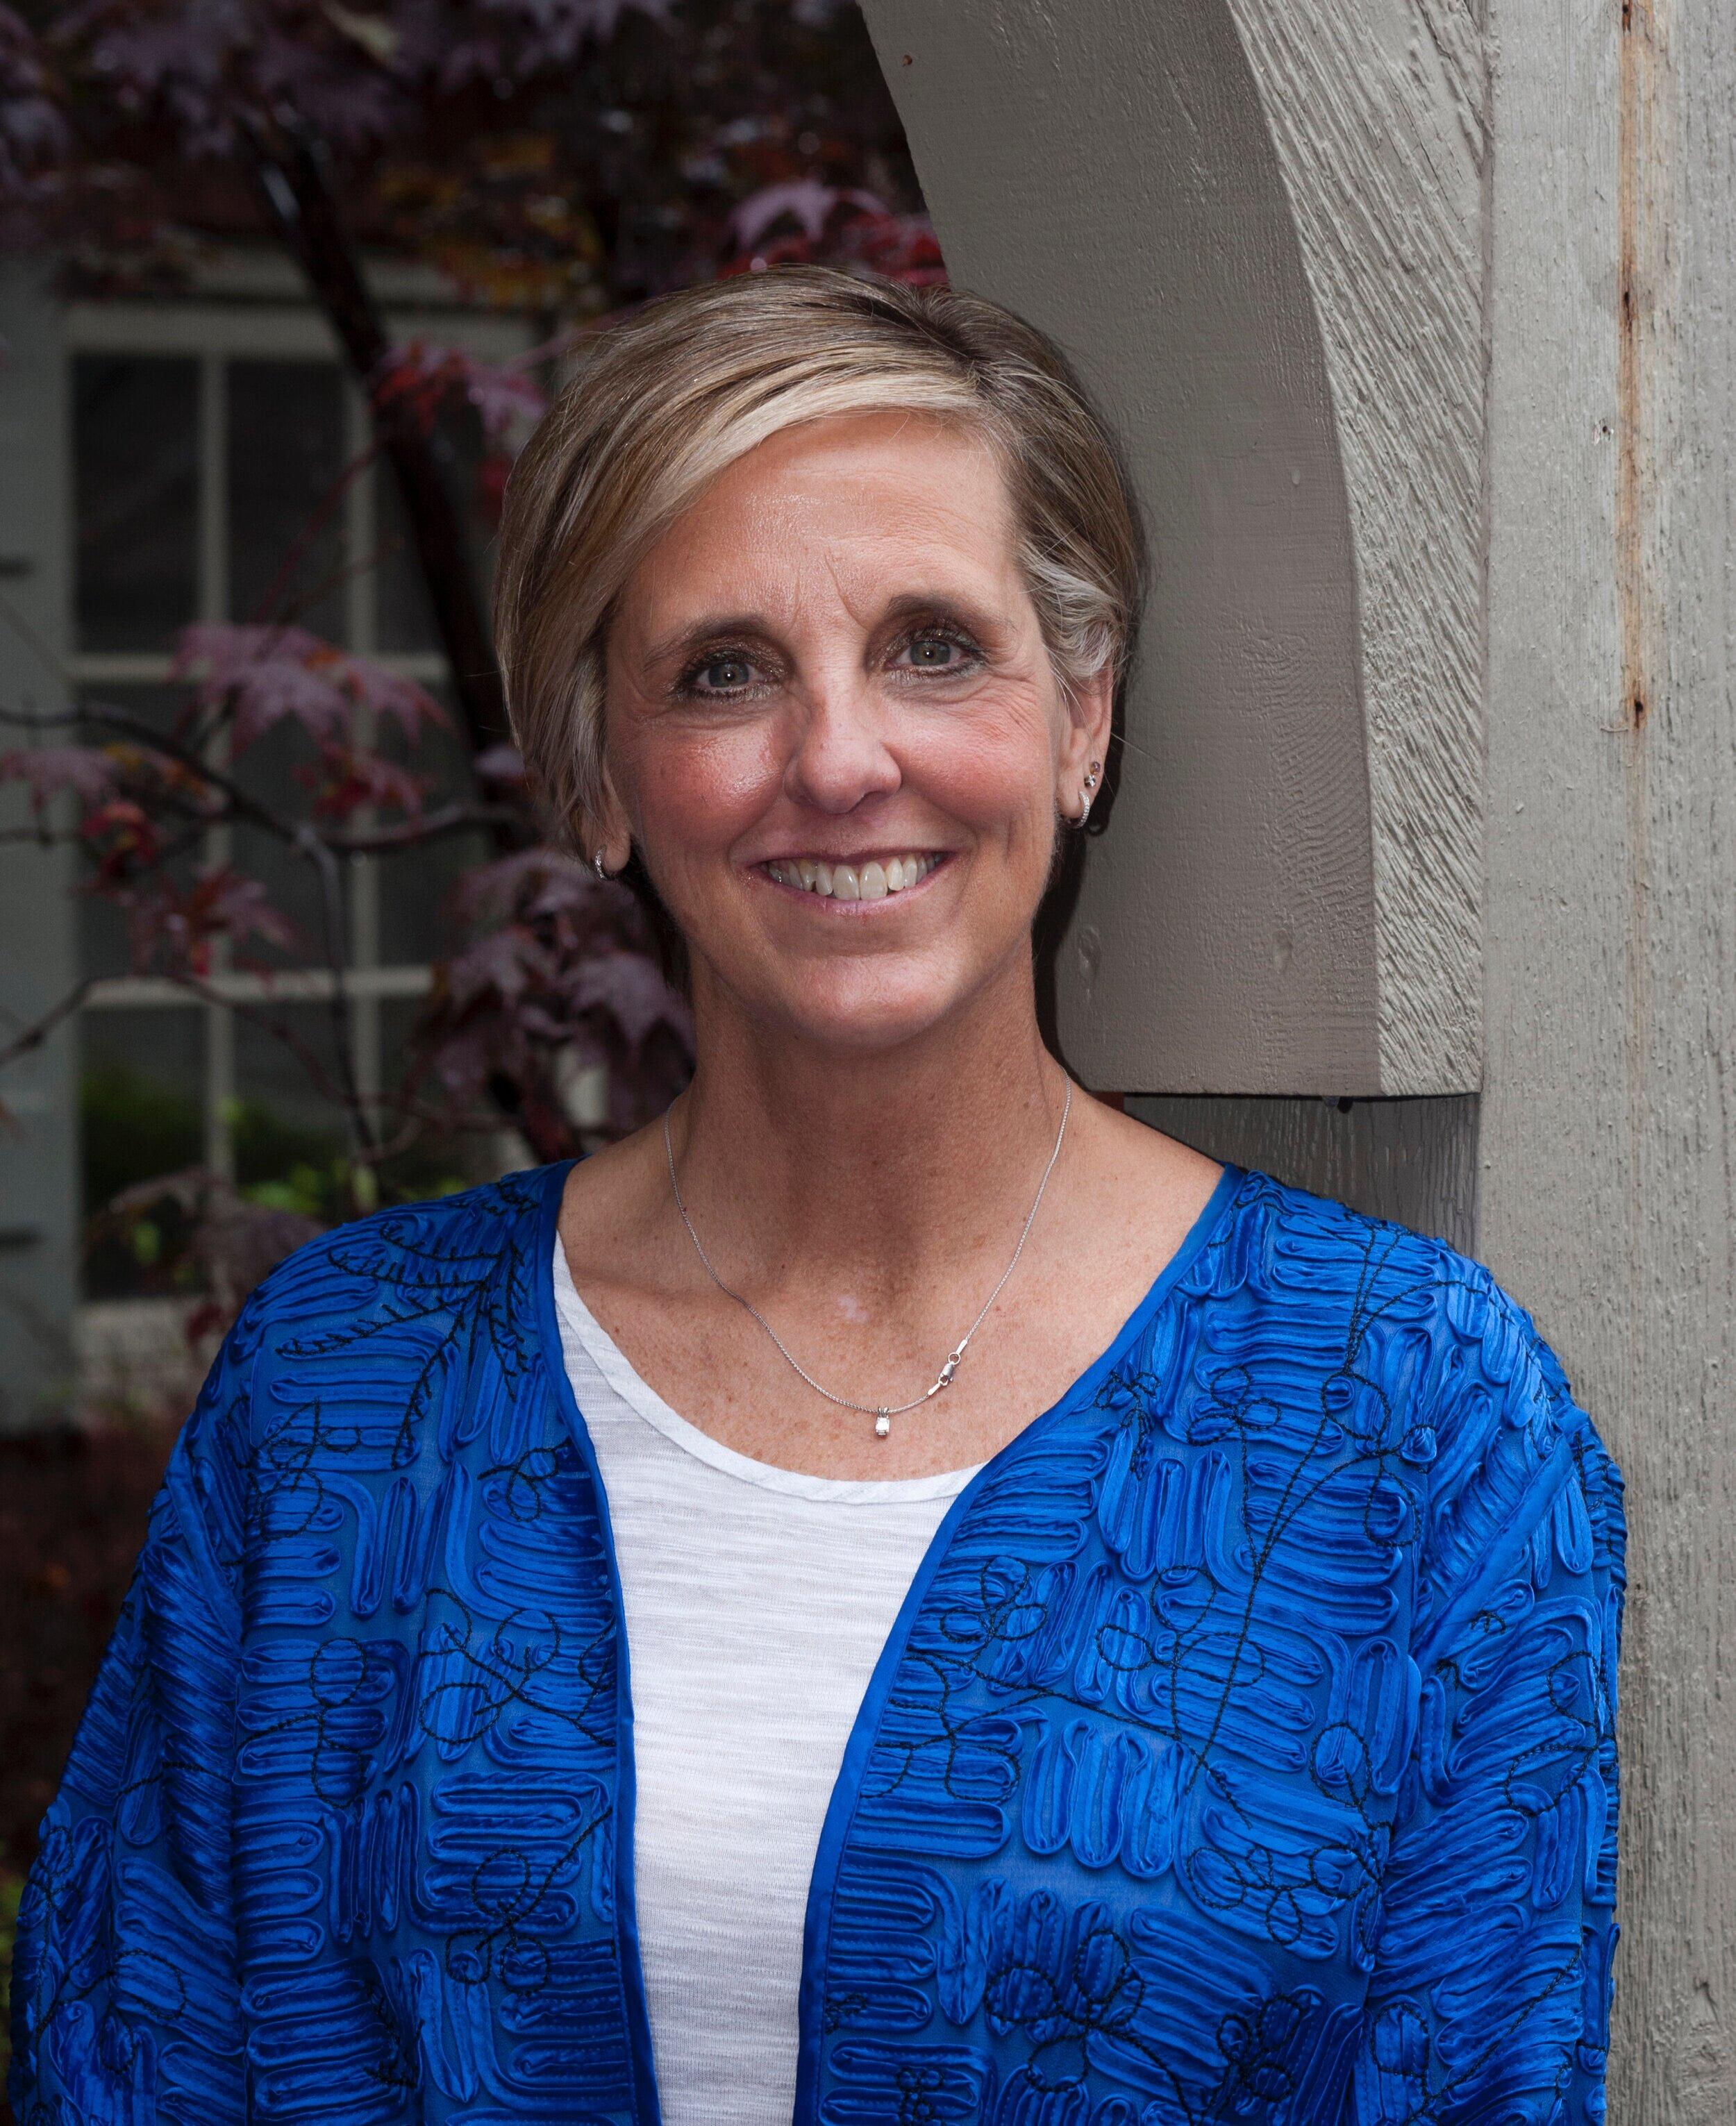 Carol Bush for State House